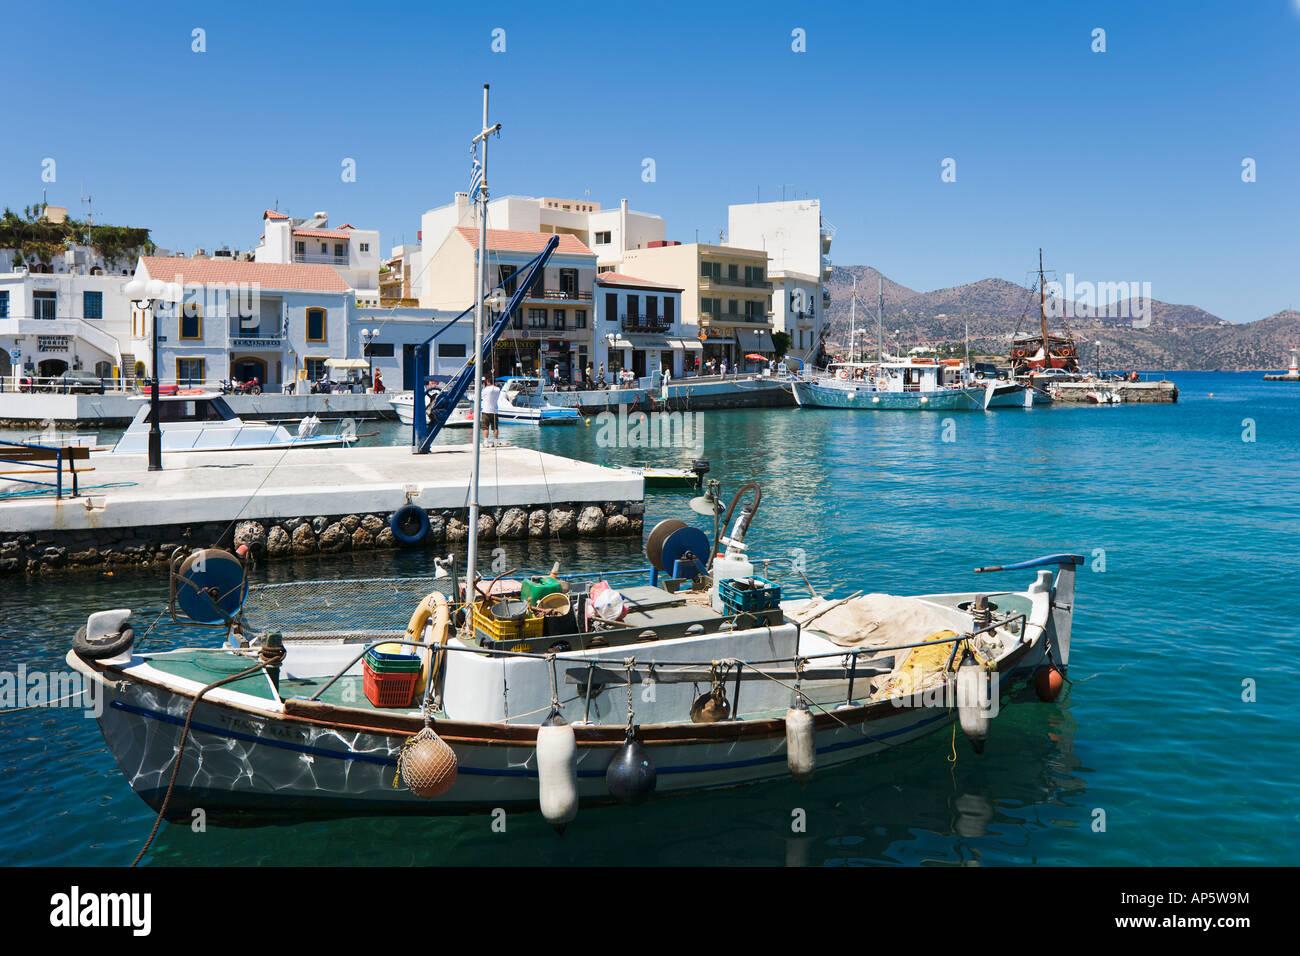 Harbour, Aghios Nikolaos, North East Coast, Crete, Greece - Stock Image